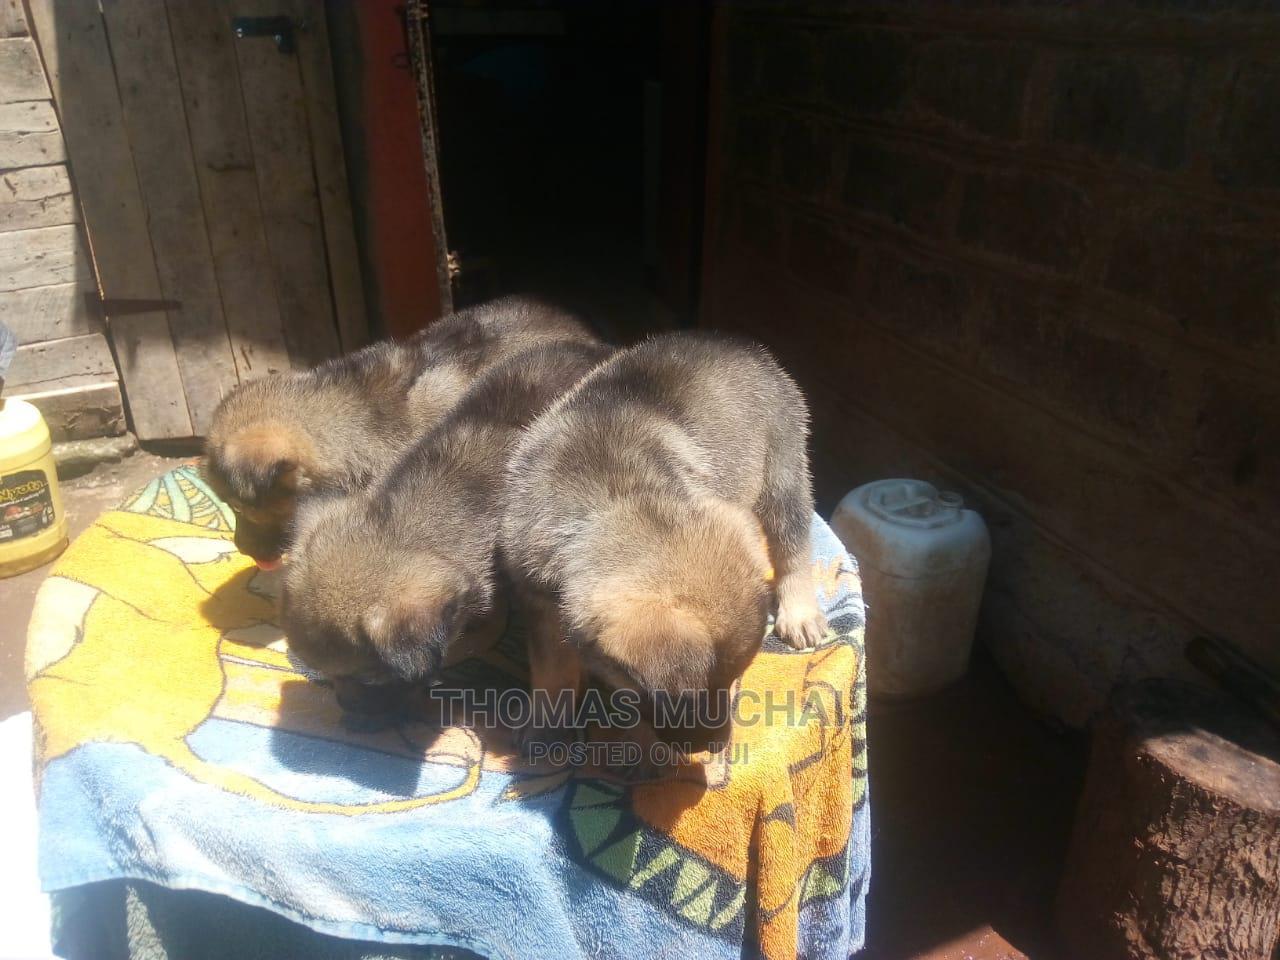 1-3 Month Female Purebred German Shepherd | Dogs & Puppies for sale in Banana, Kiambu, Kenya